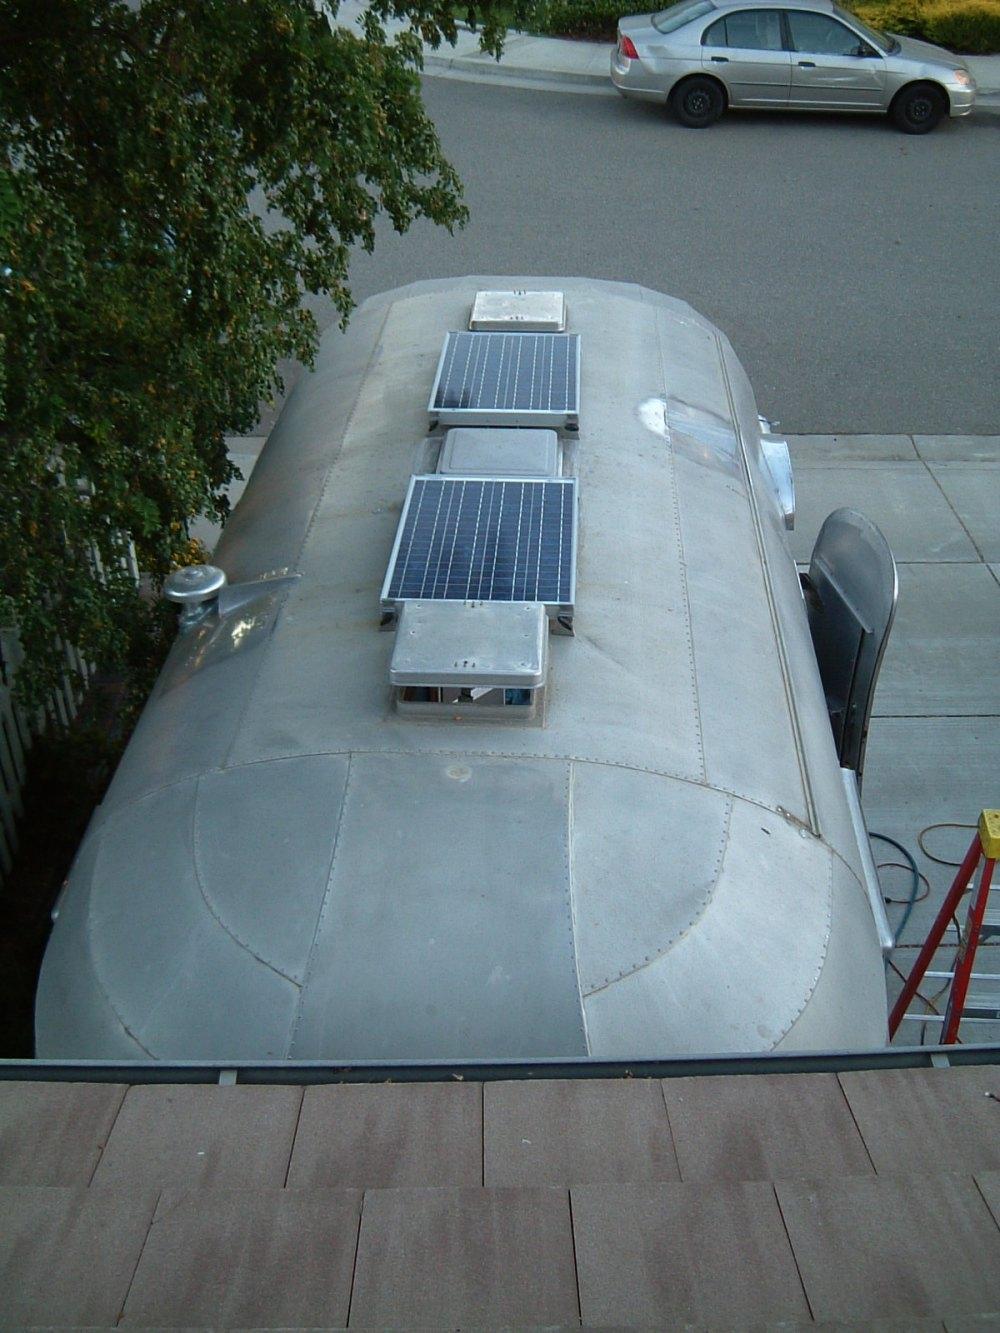 Airstream Solar Wiring Diagram - Smart Wiring Diagrams •